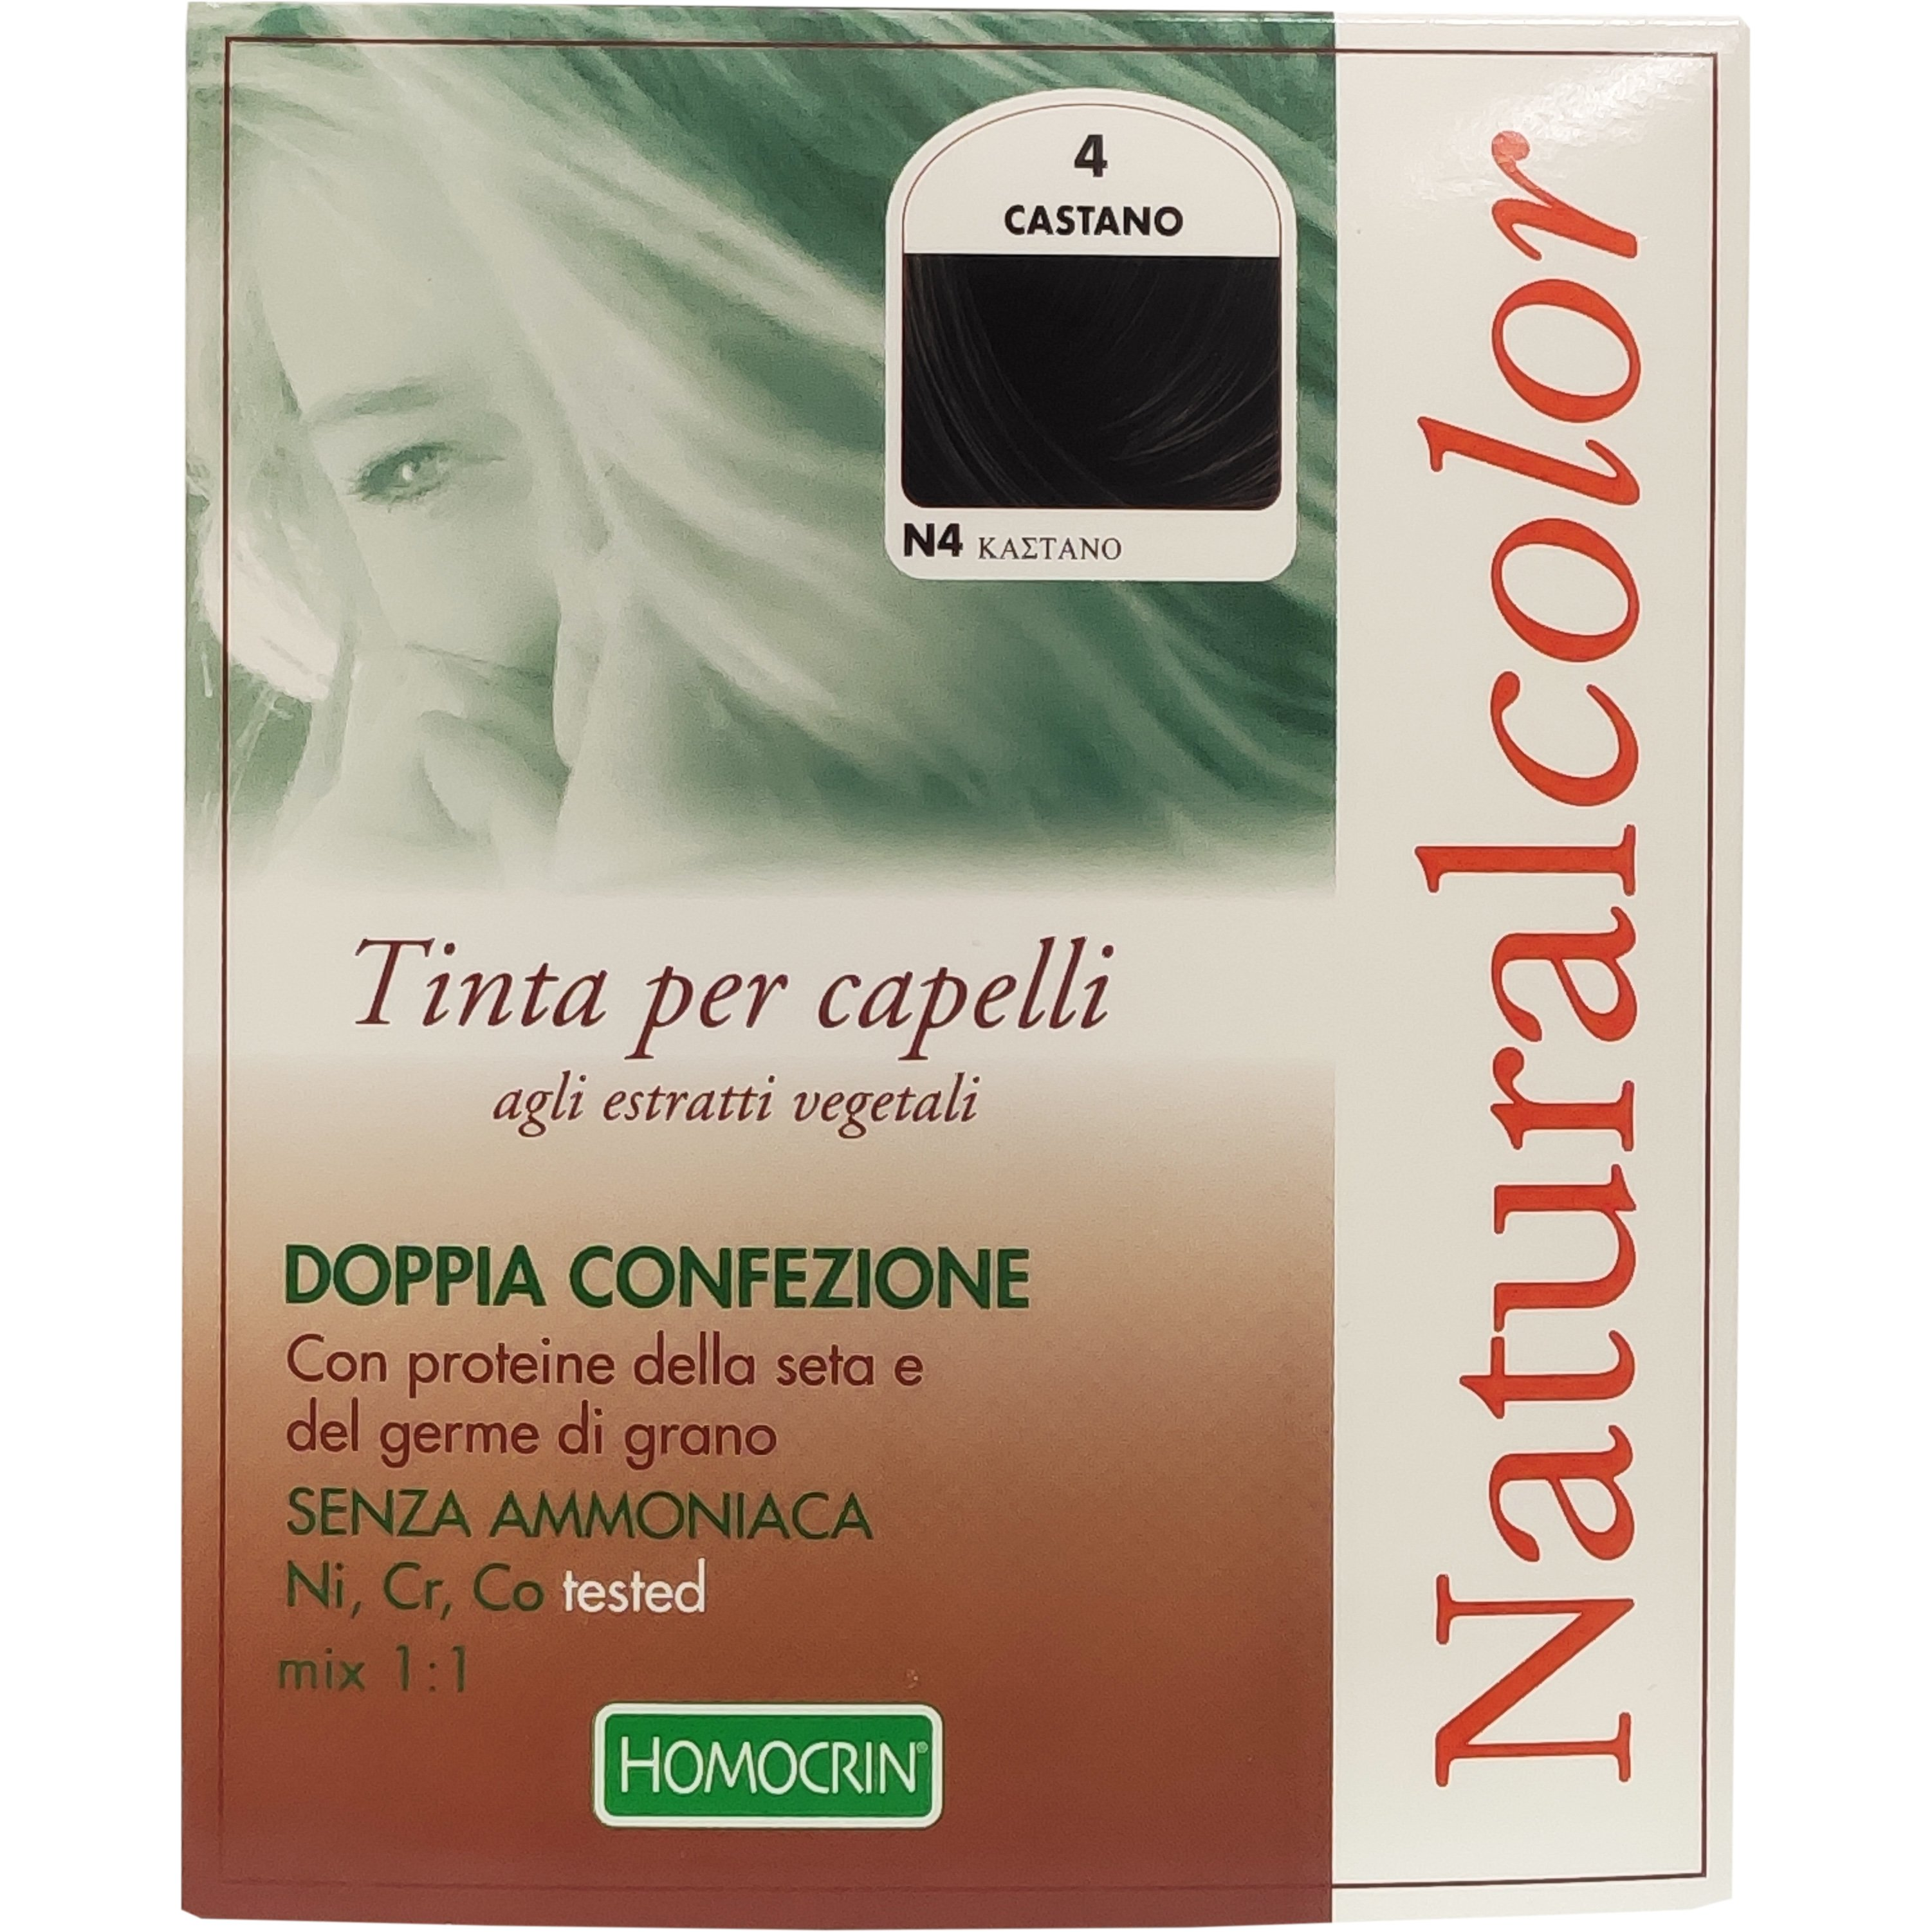 Specchiasol Homocrin Natural Color Φυτική Βαφή Μαλλιών Χωρίς Αμμωνία 1 Τεμάχιο – Ν4 Καστανό